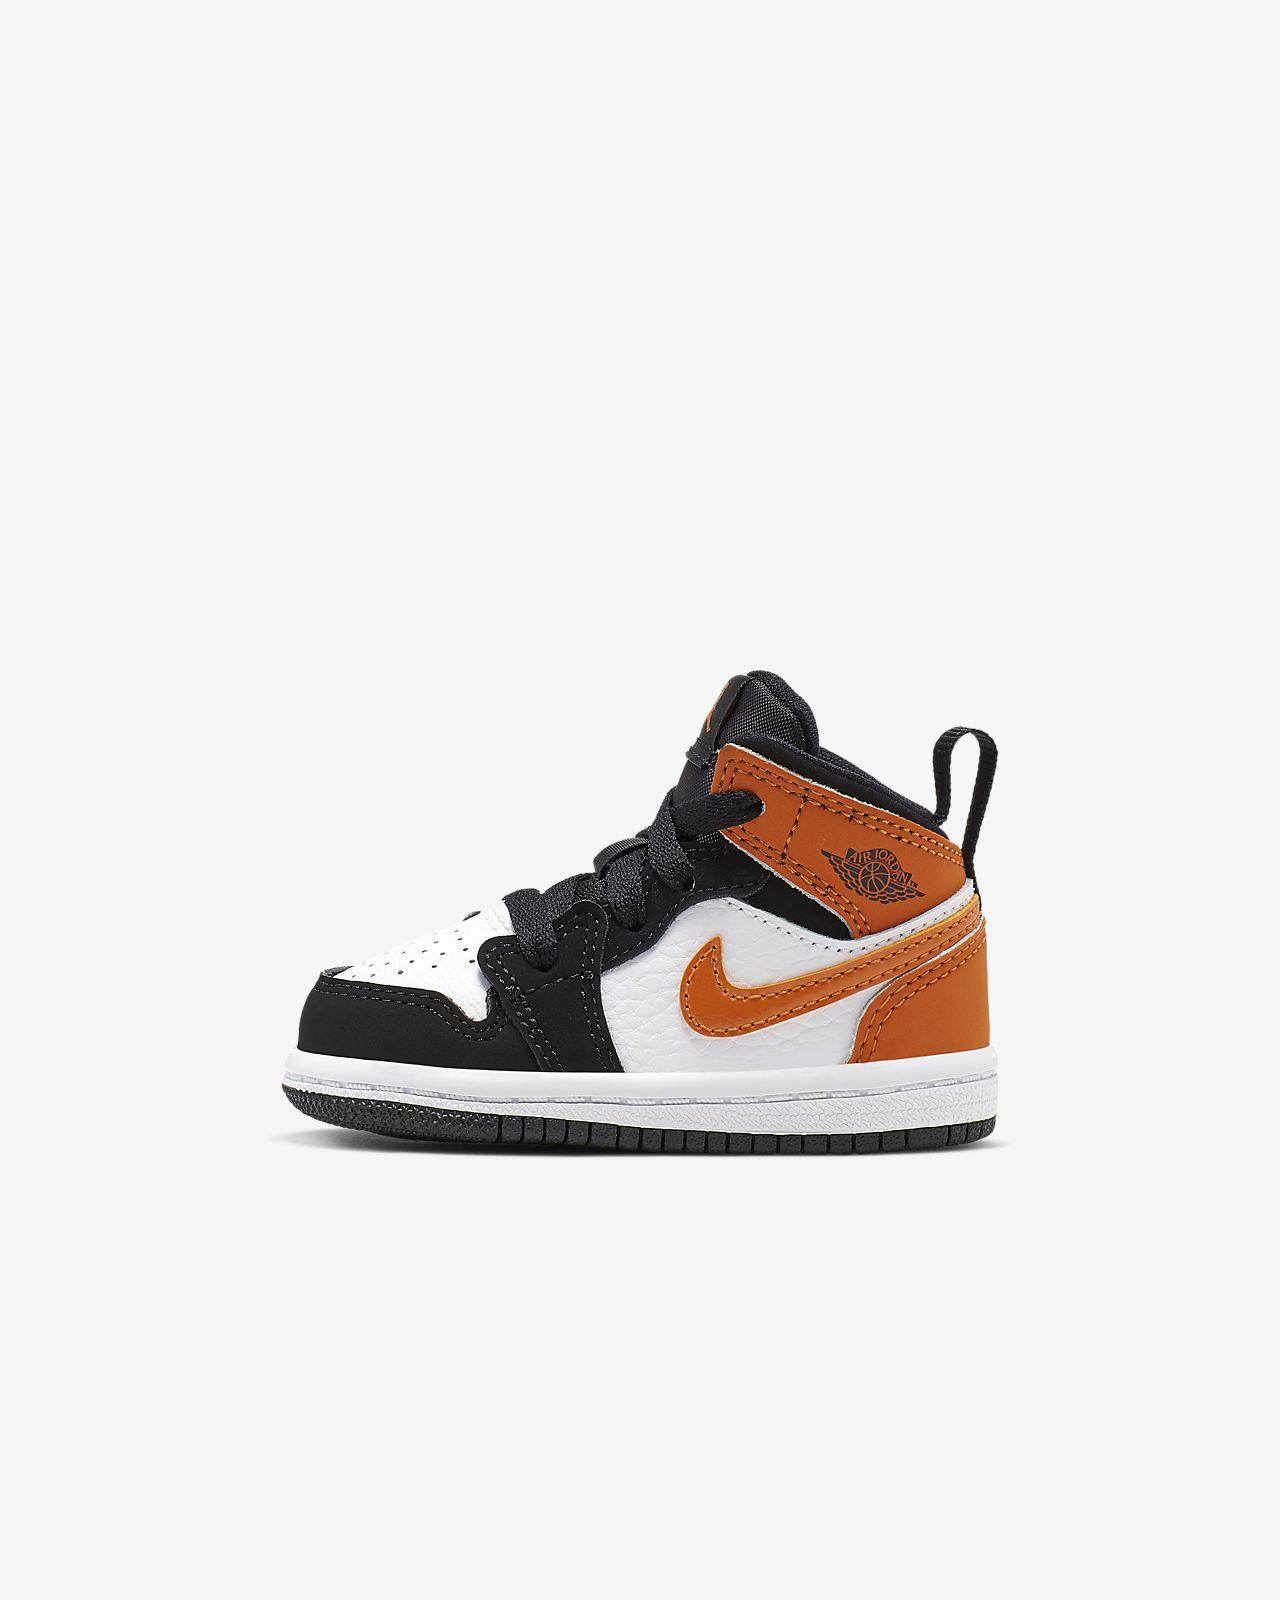 Air Jordan 1 Mid-sko for sped-/småbarn